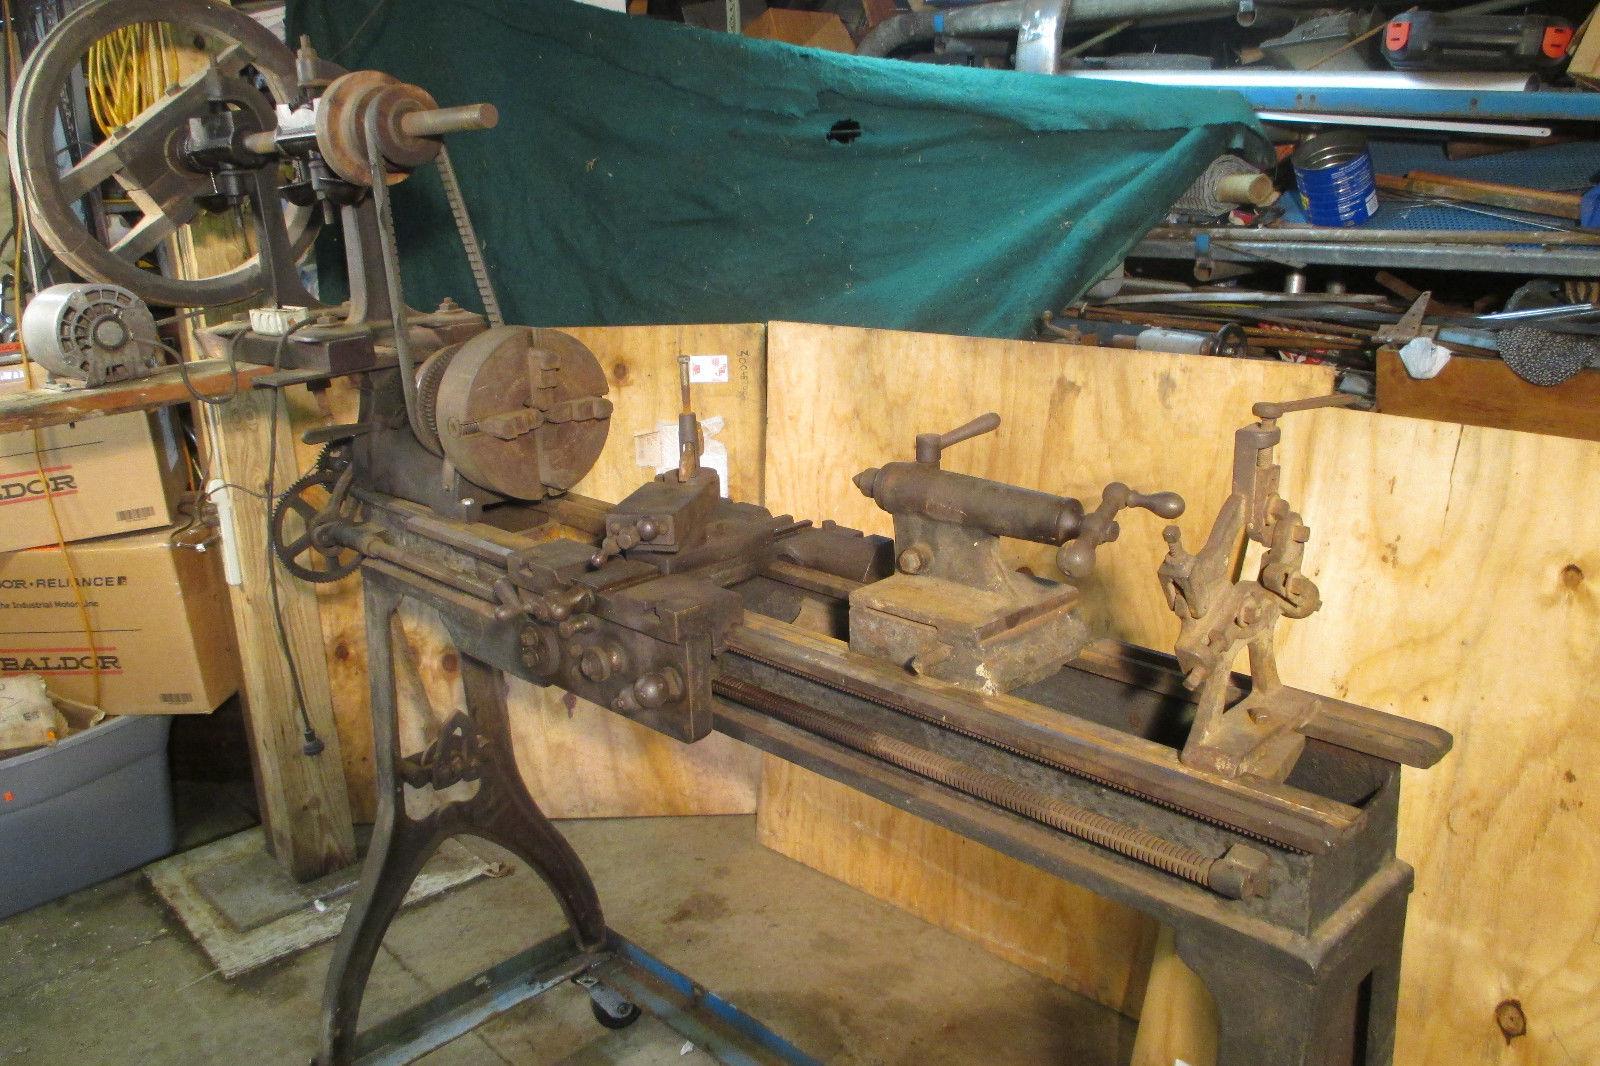 http://antiquemachinery.com/images/000-sheppard-lathe-2.JPG/